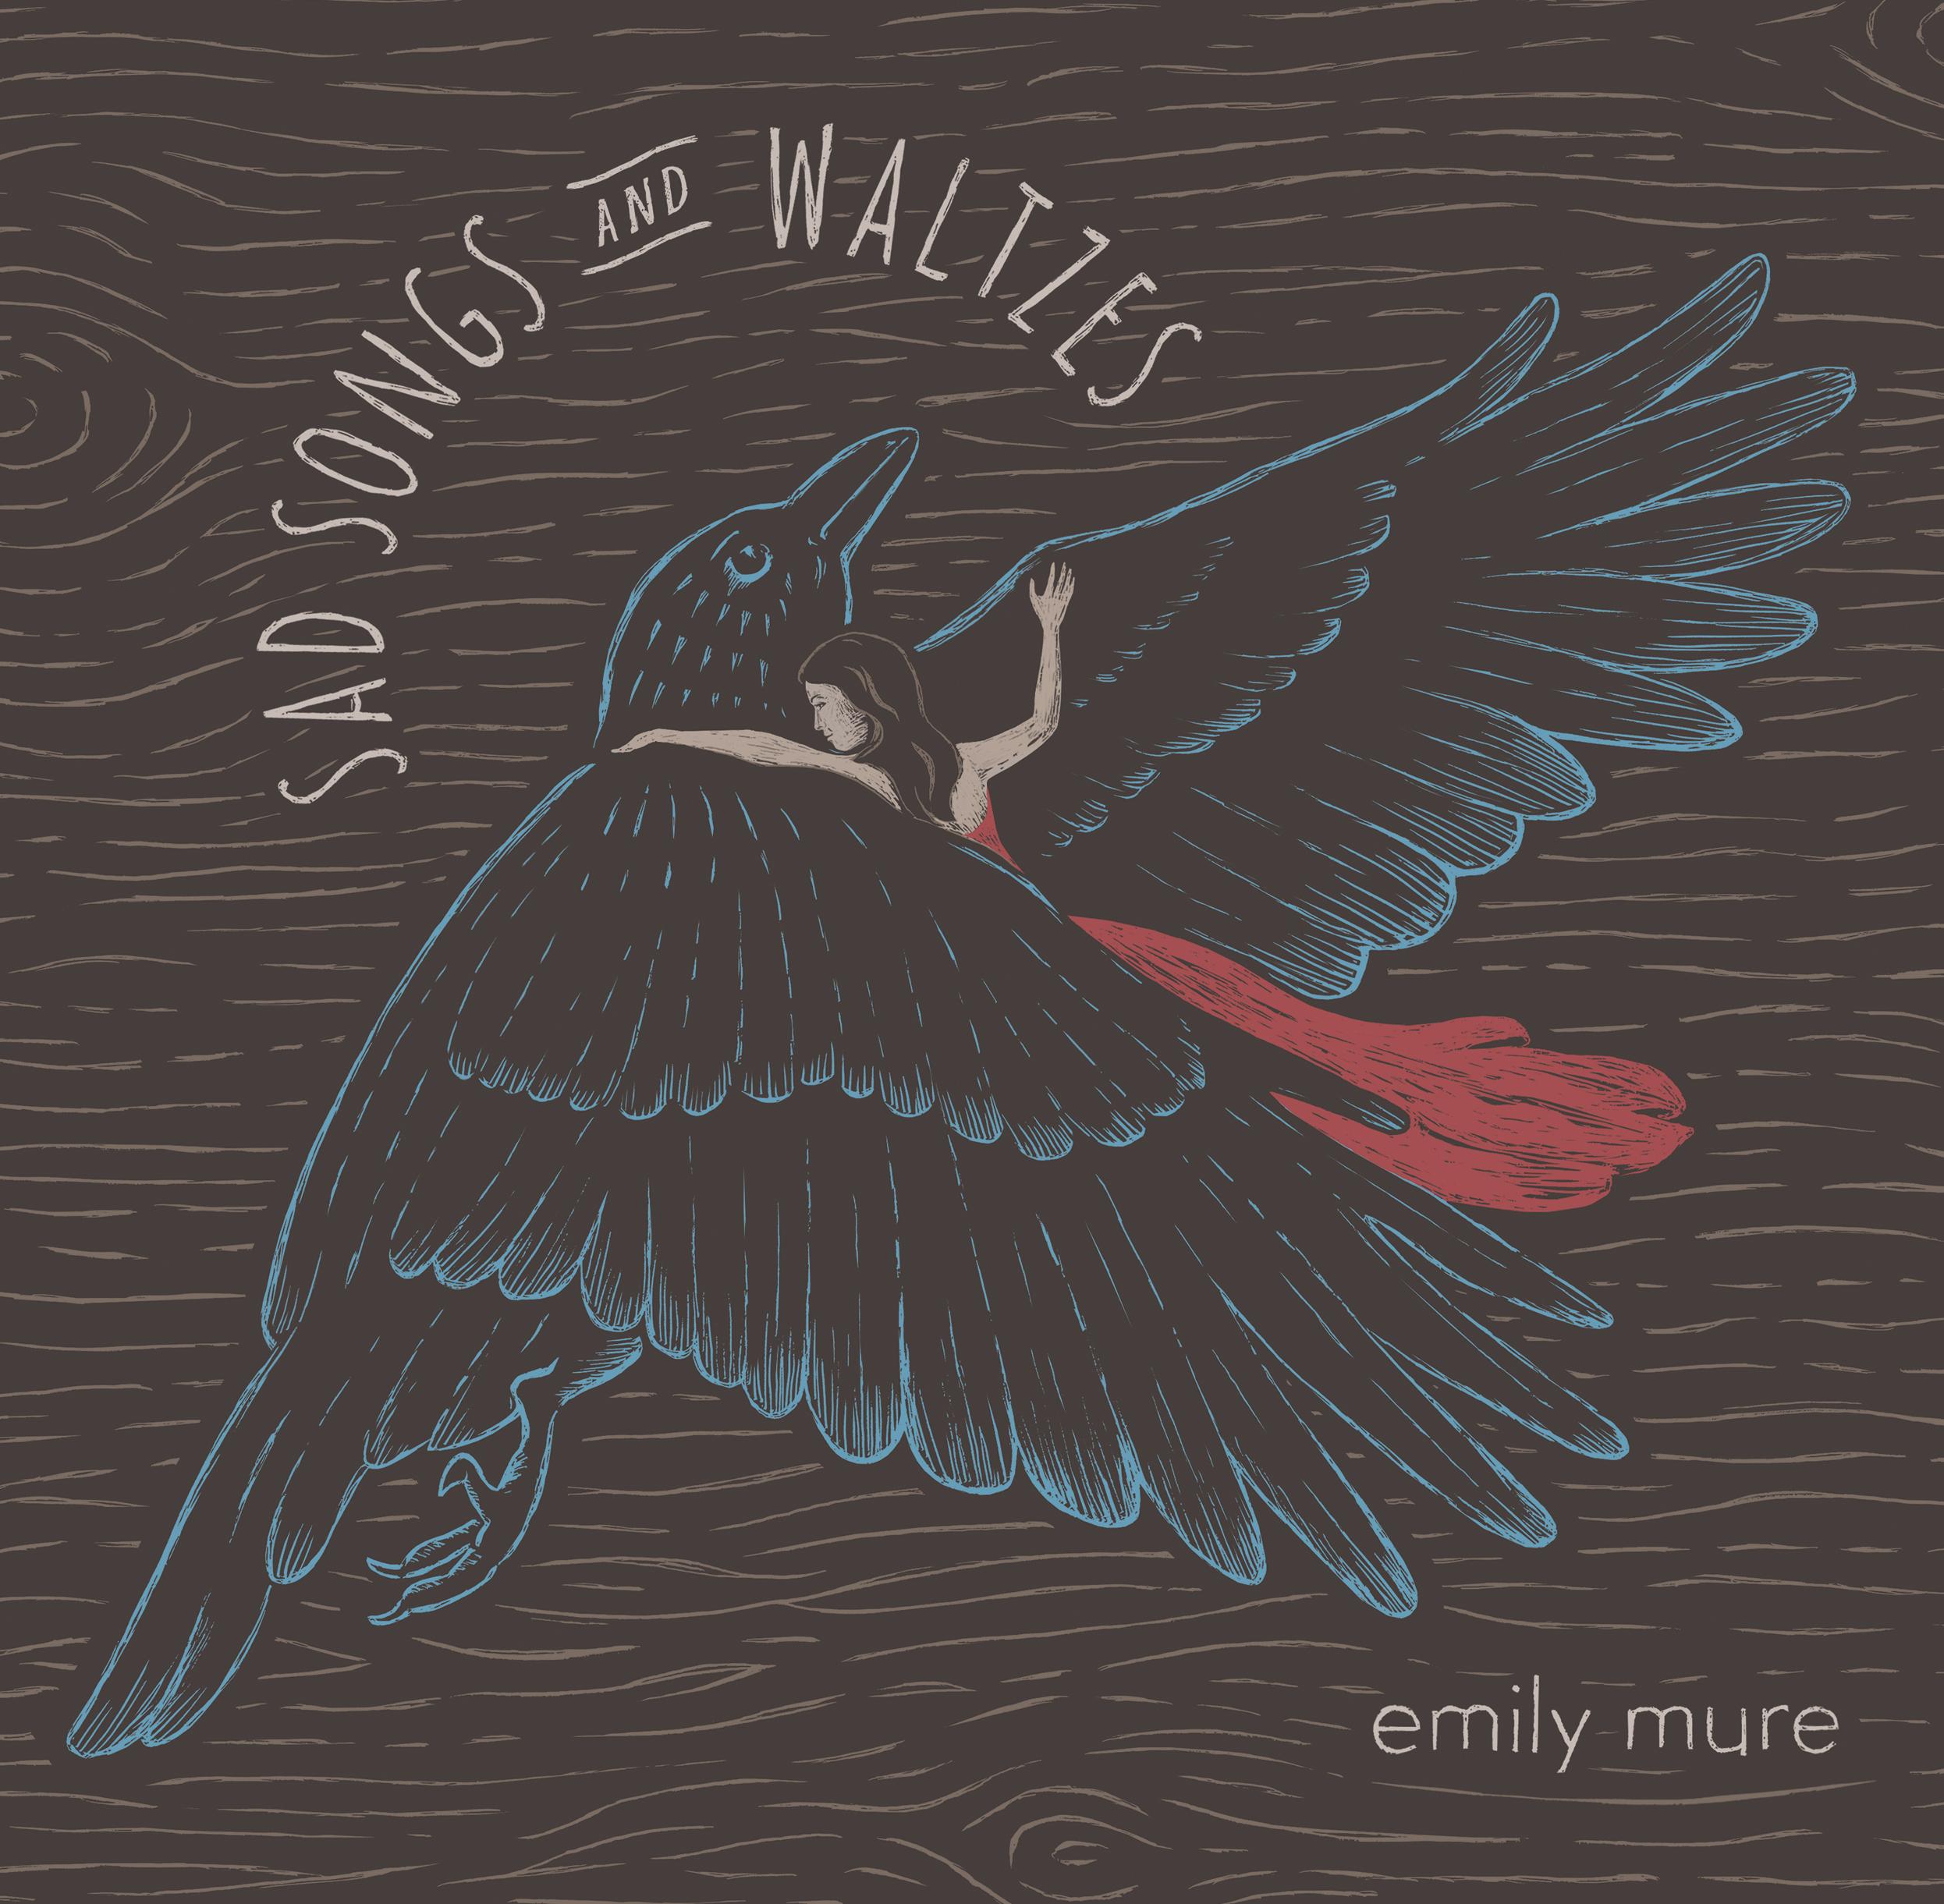 emily-mure-sad-songs-and-waltzes.jpg